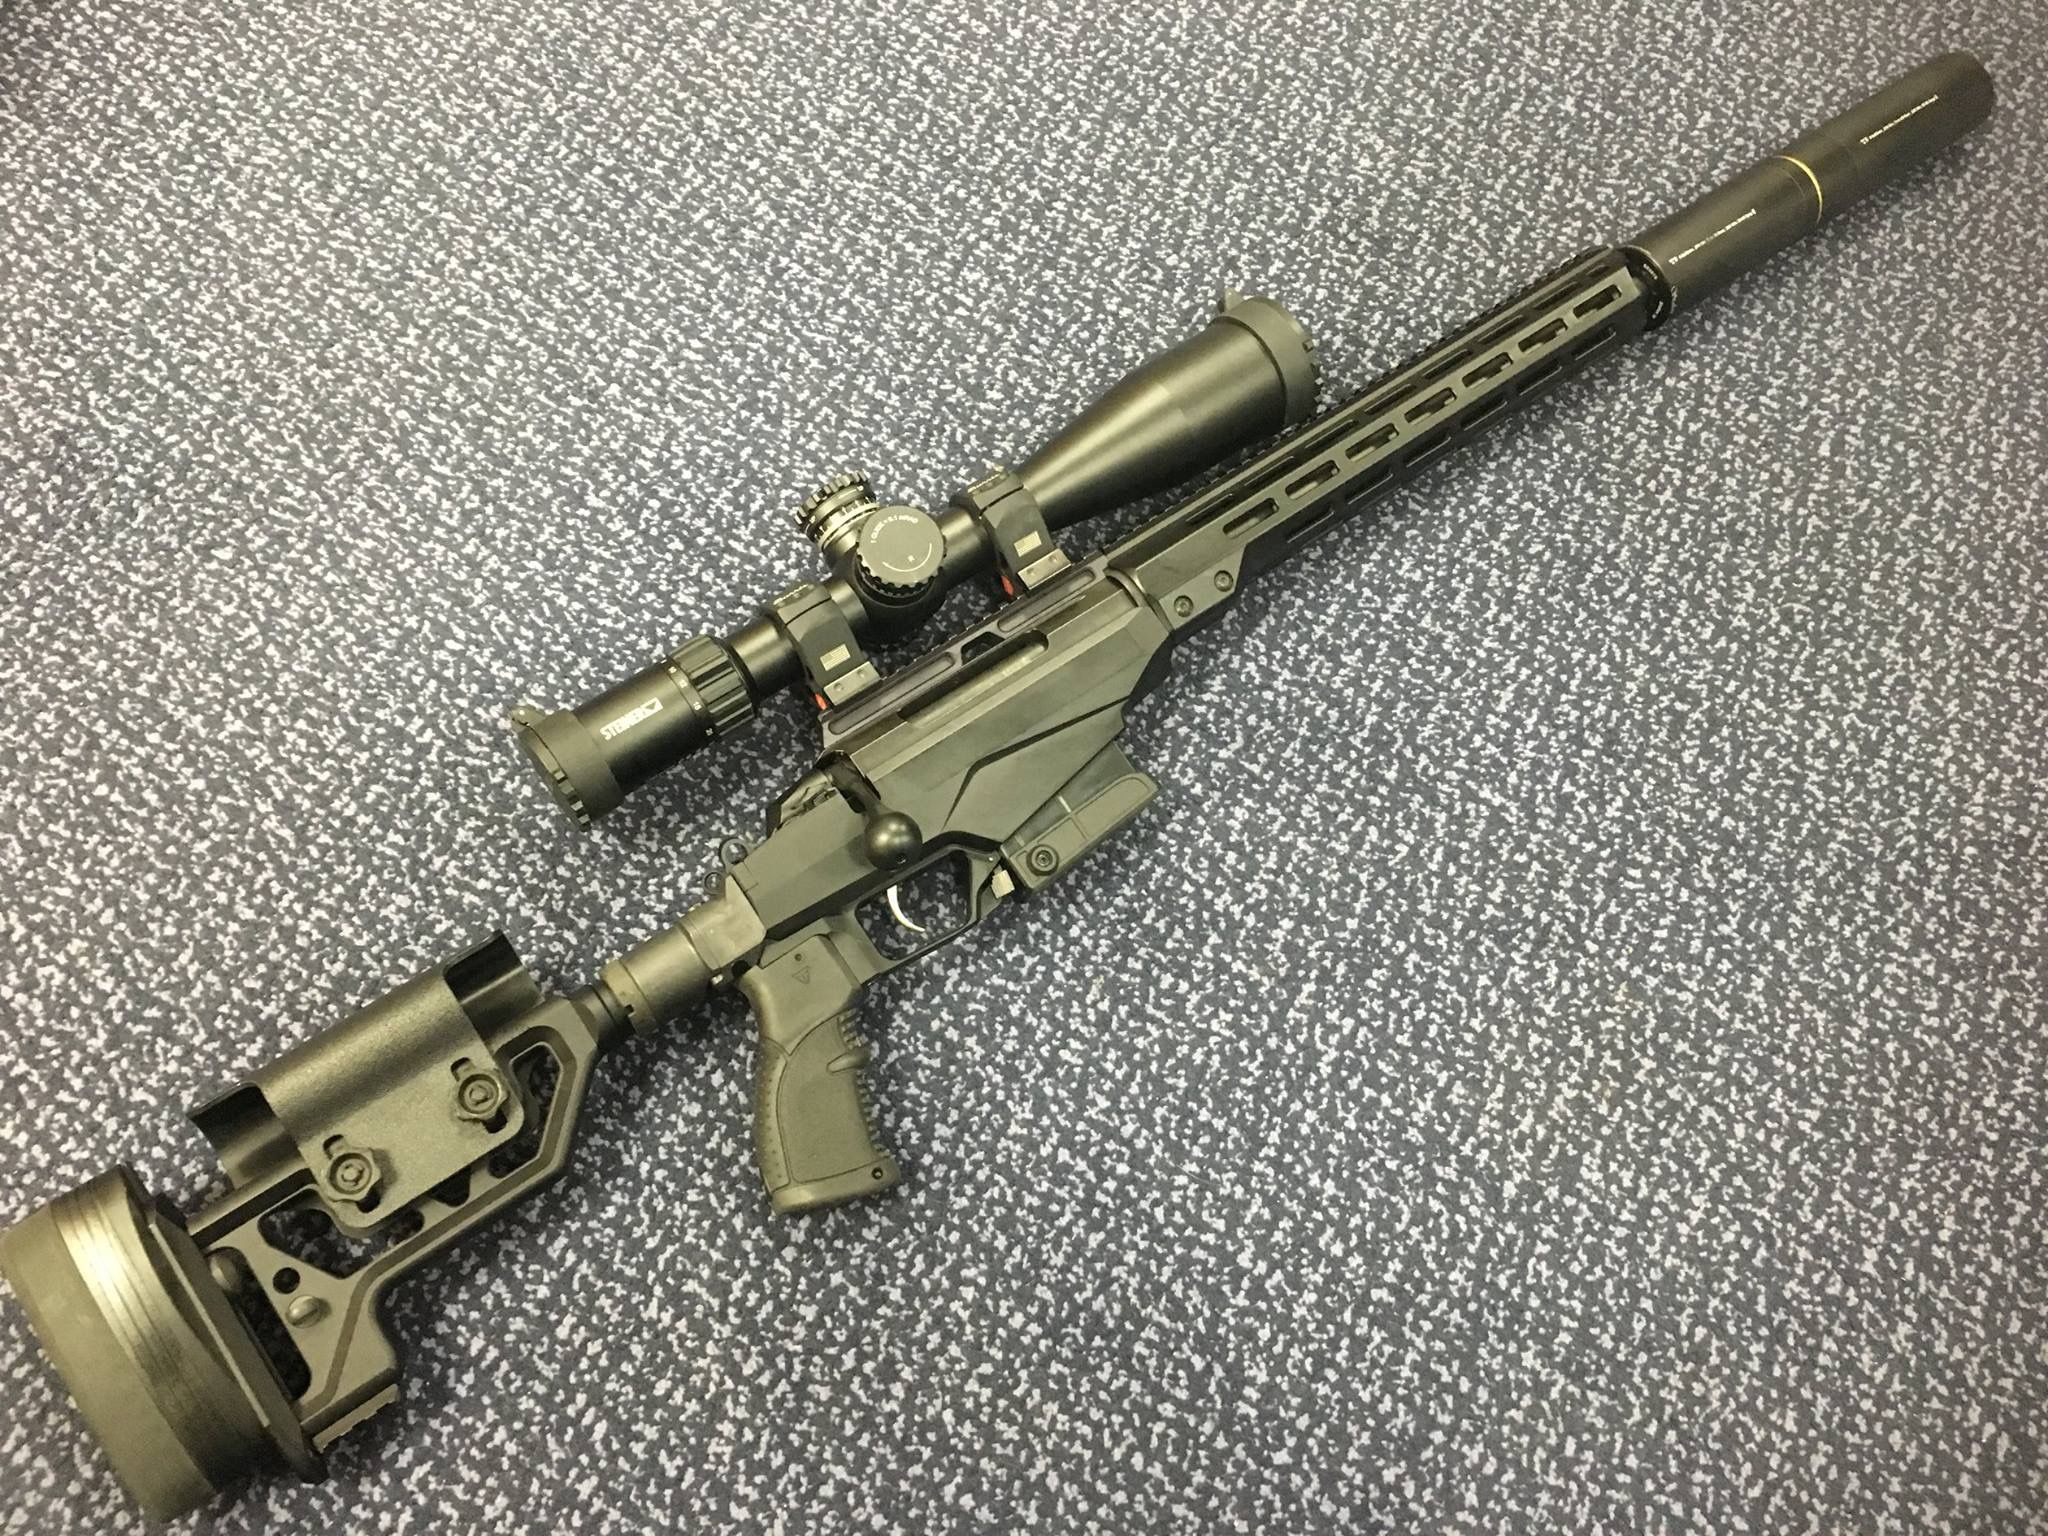 Pin by Bryte Stewart on shots fired | Guns, Rifle targets